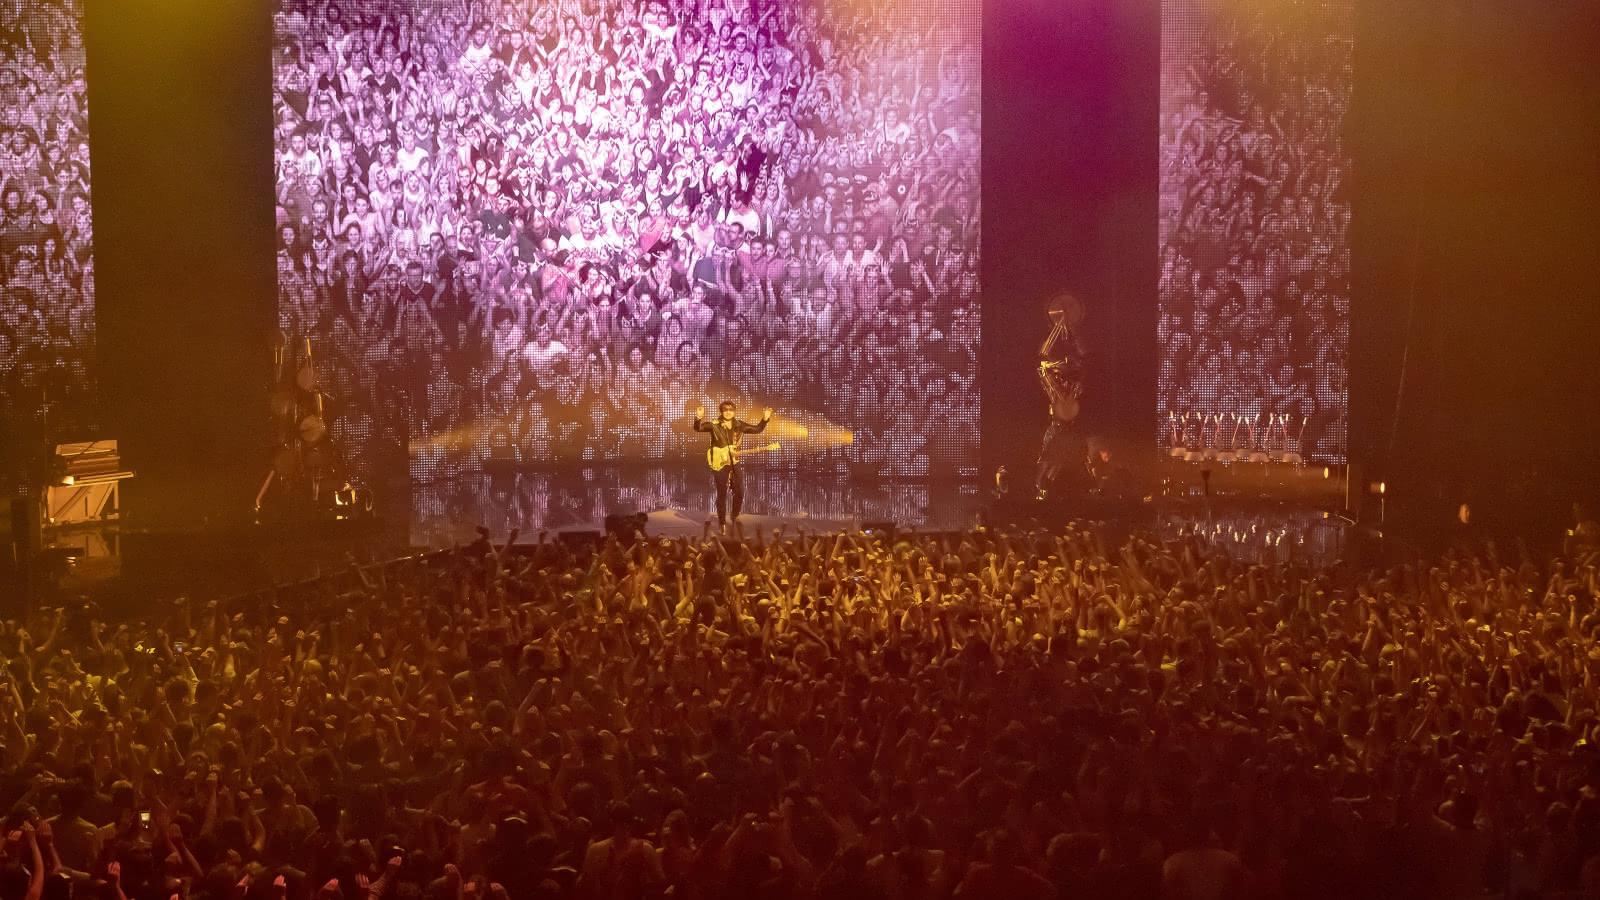 Concert Halle Olympique